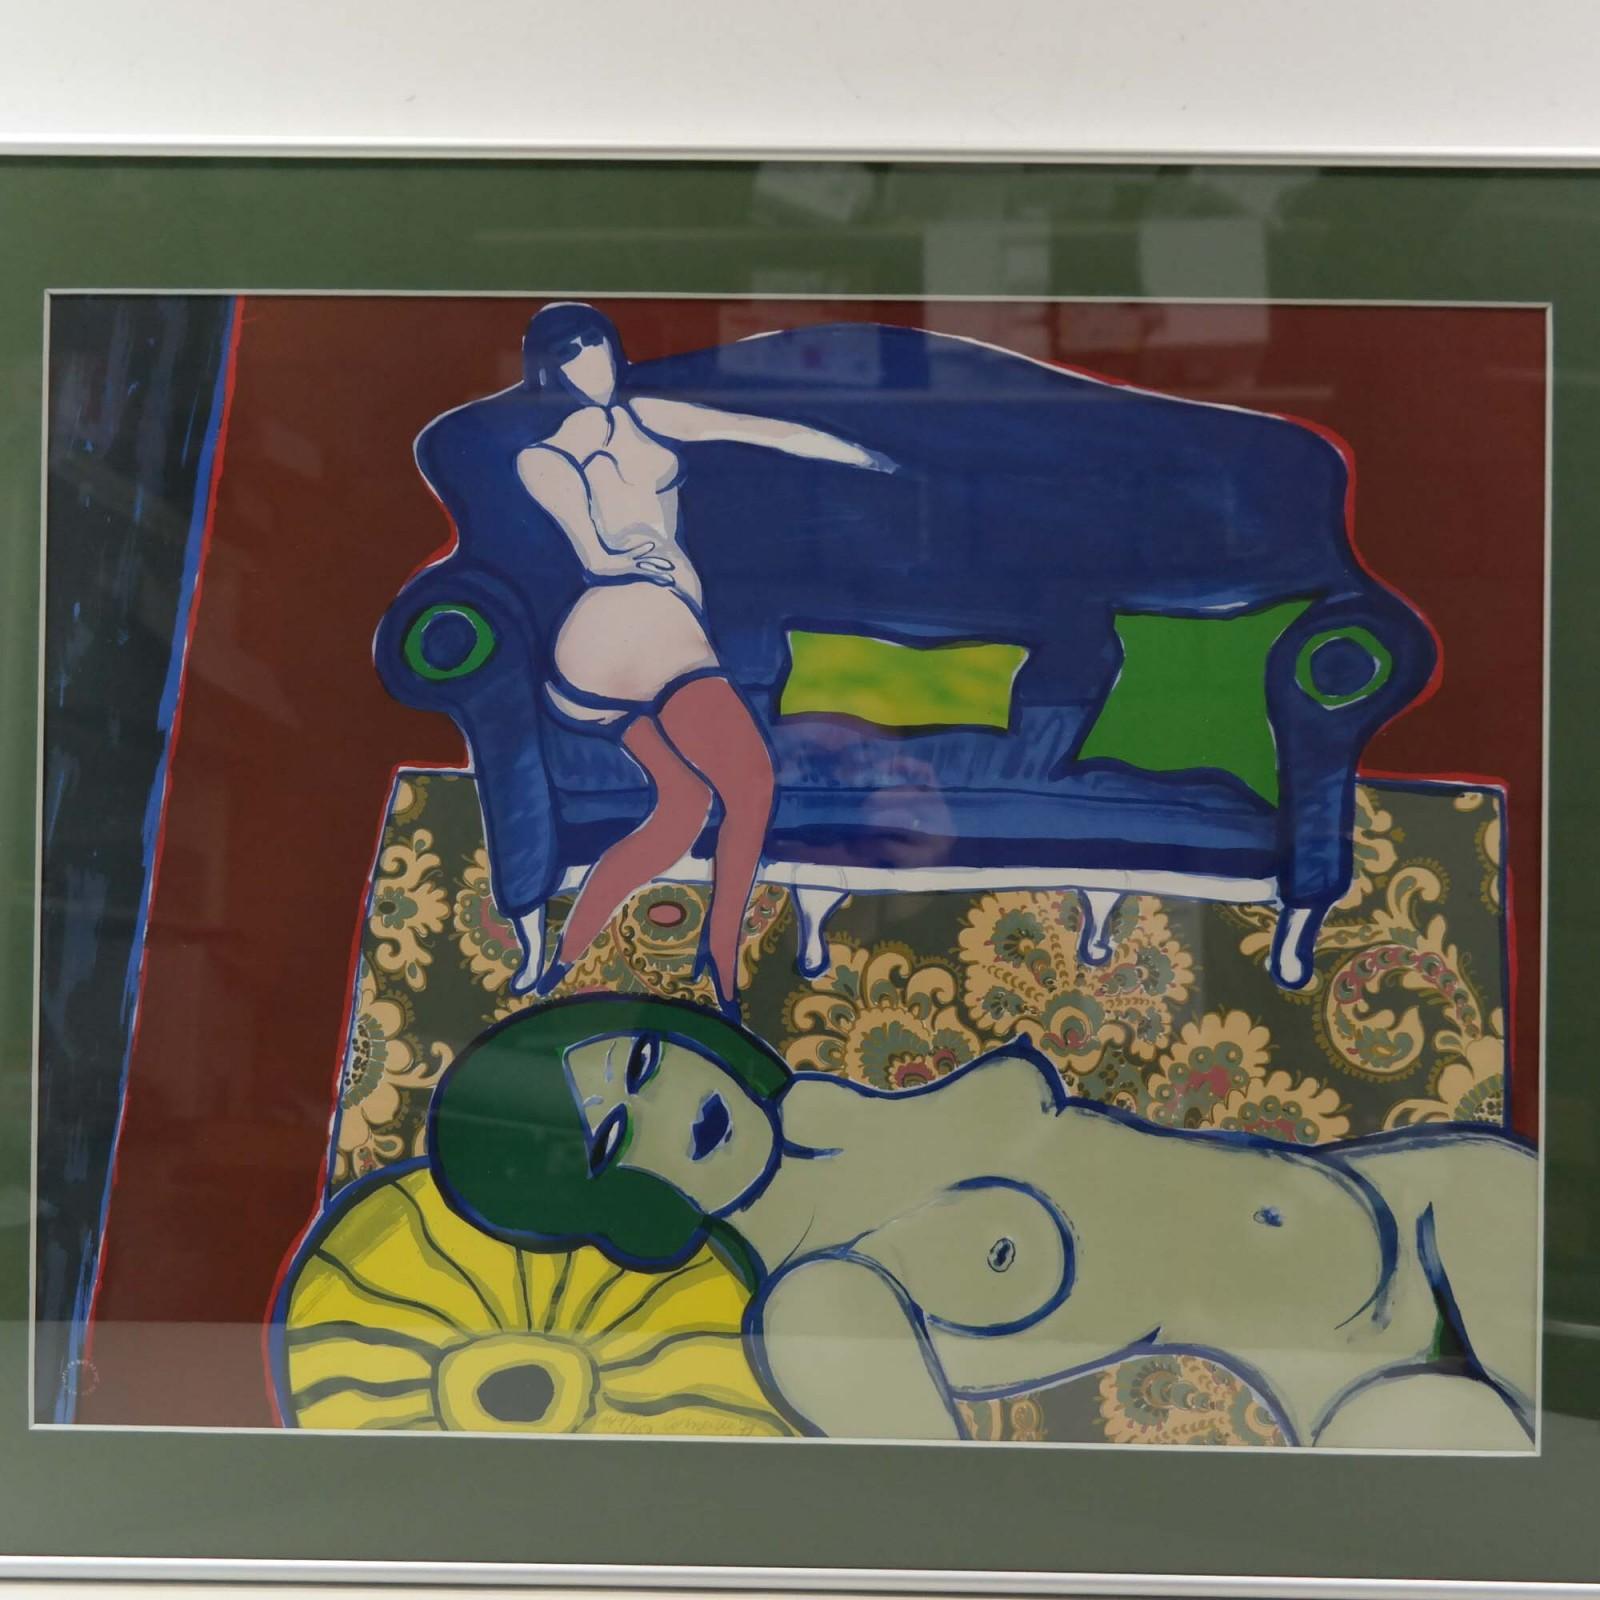 Corneille (1922-2010) - New York Rooms 2